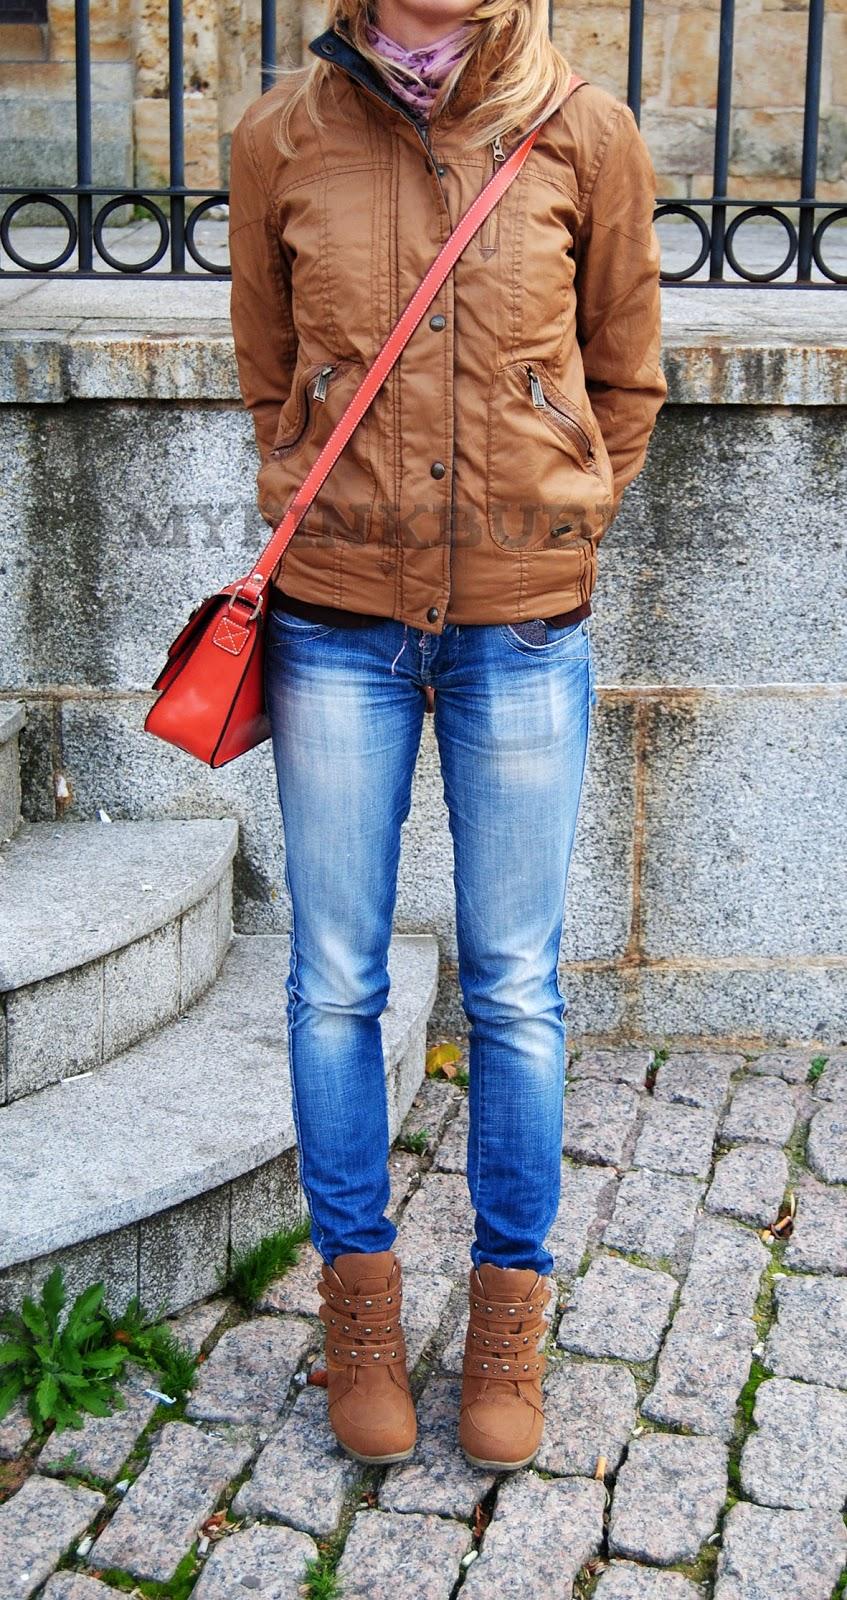 Outfit sneakers my pinkbubble blog de belleza - Combinar color marron ...